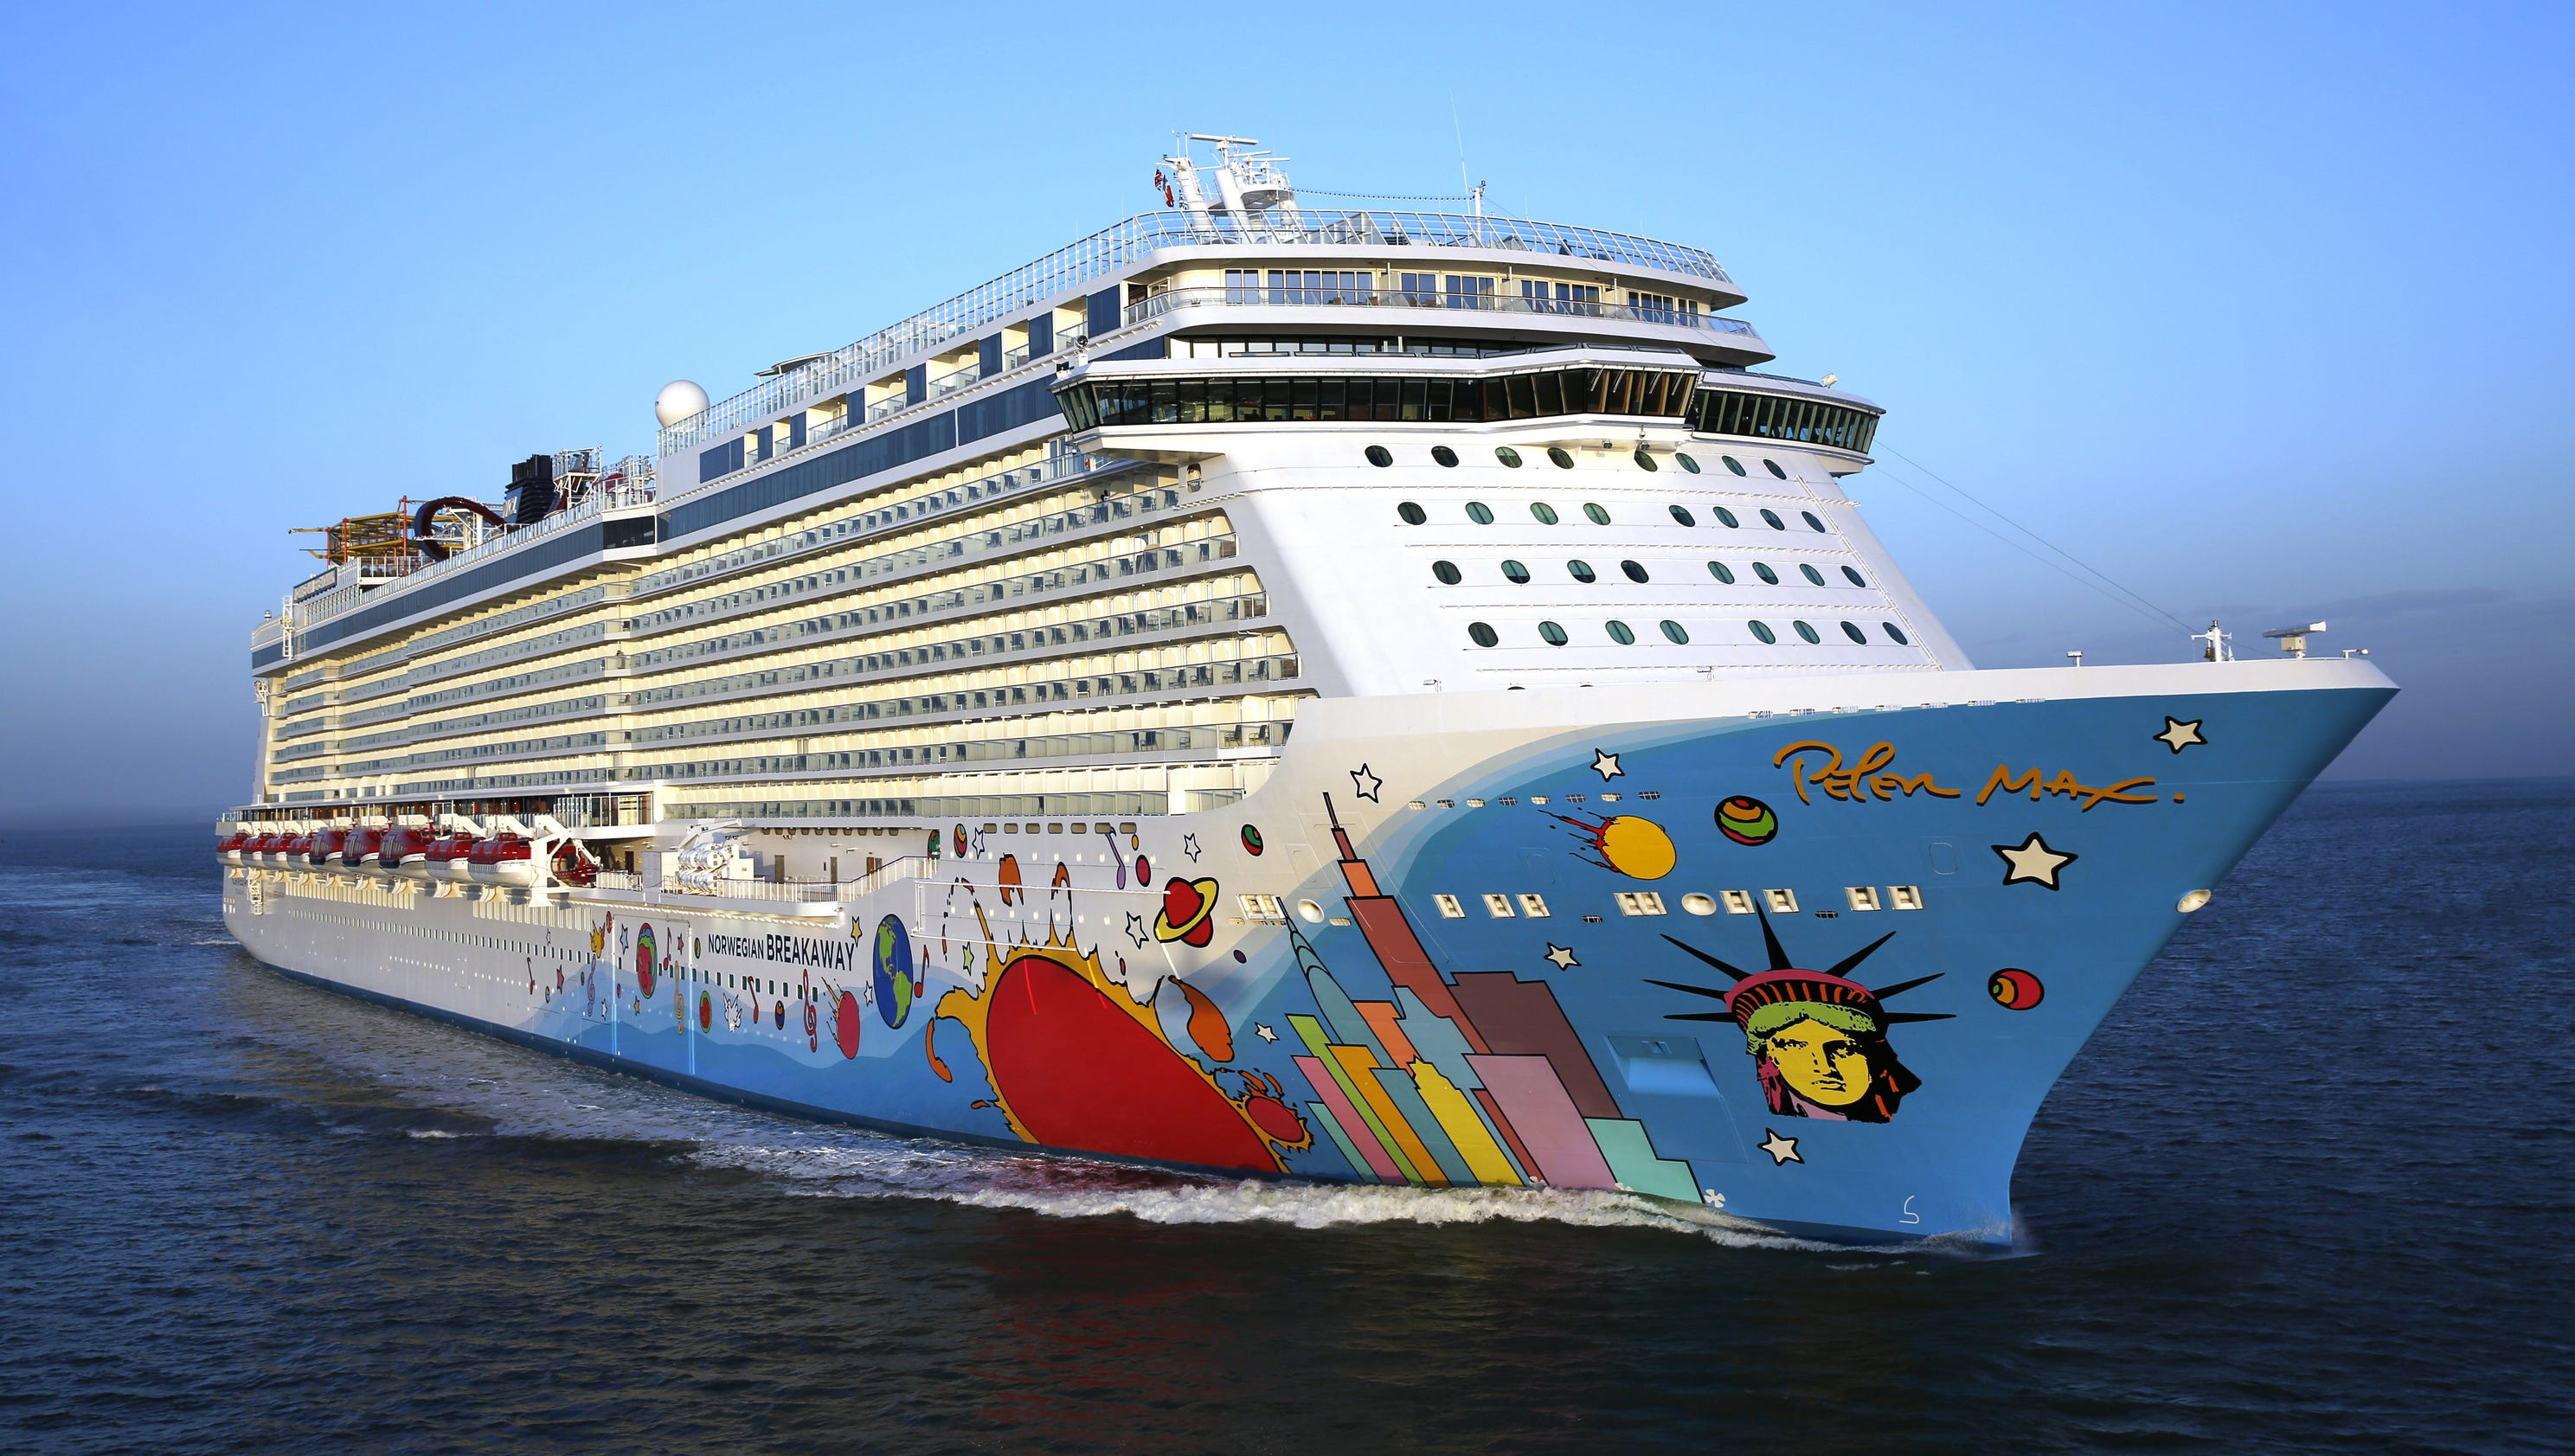 4-year-old Boy Dies Aboard Cruise Ship